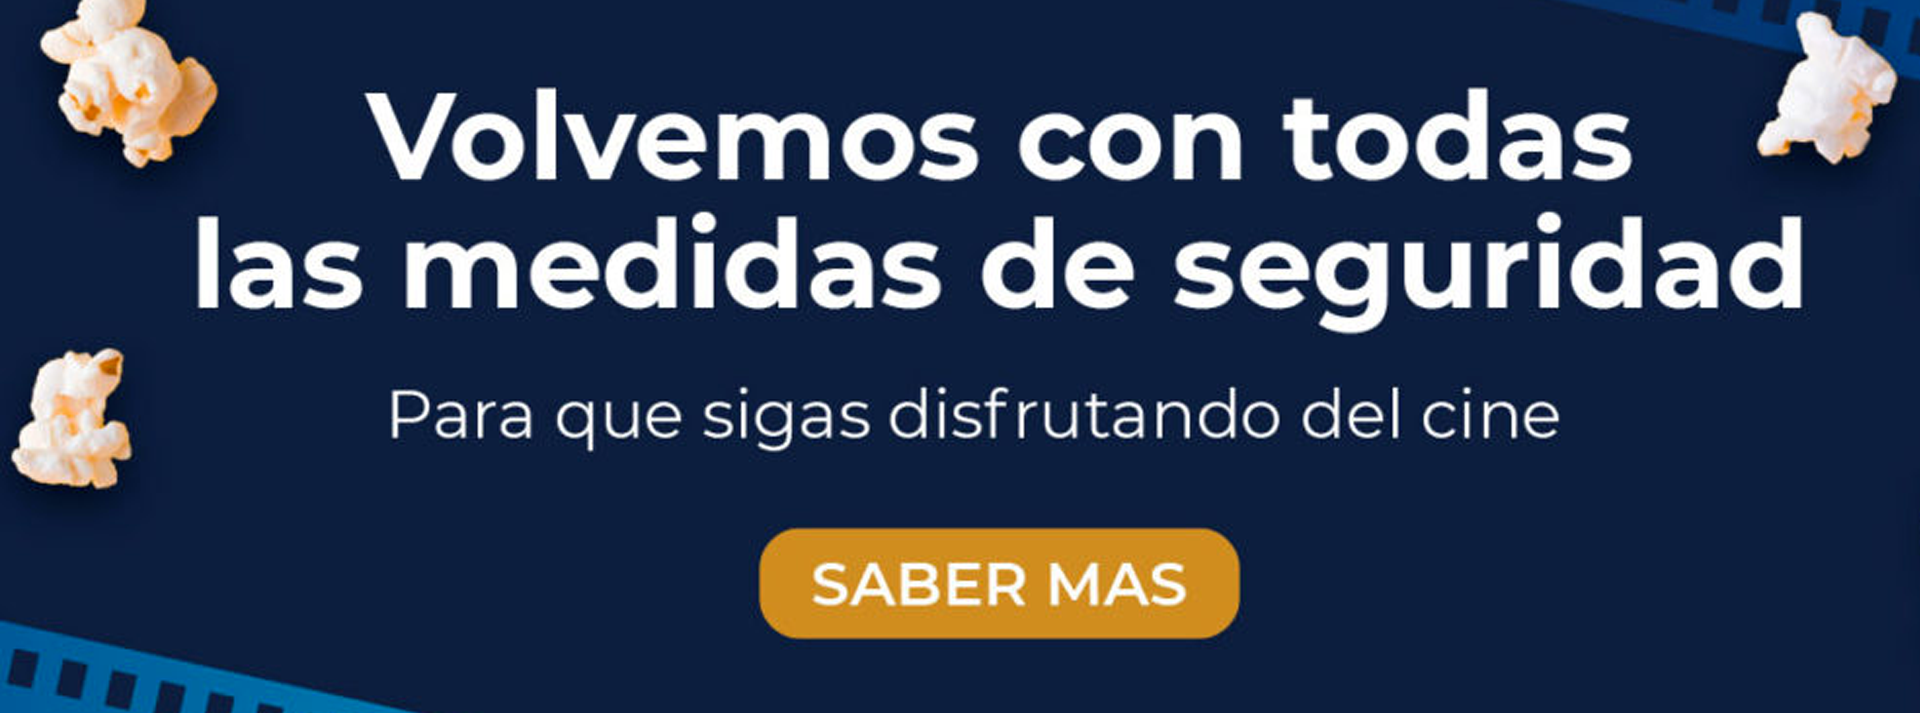 Banner_Ajustado2